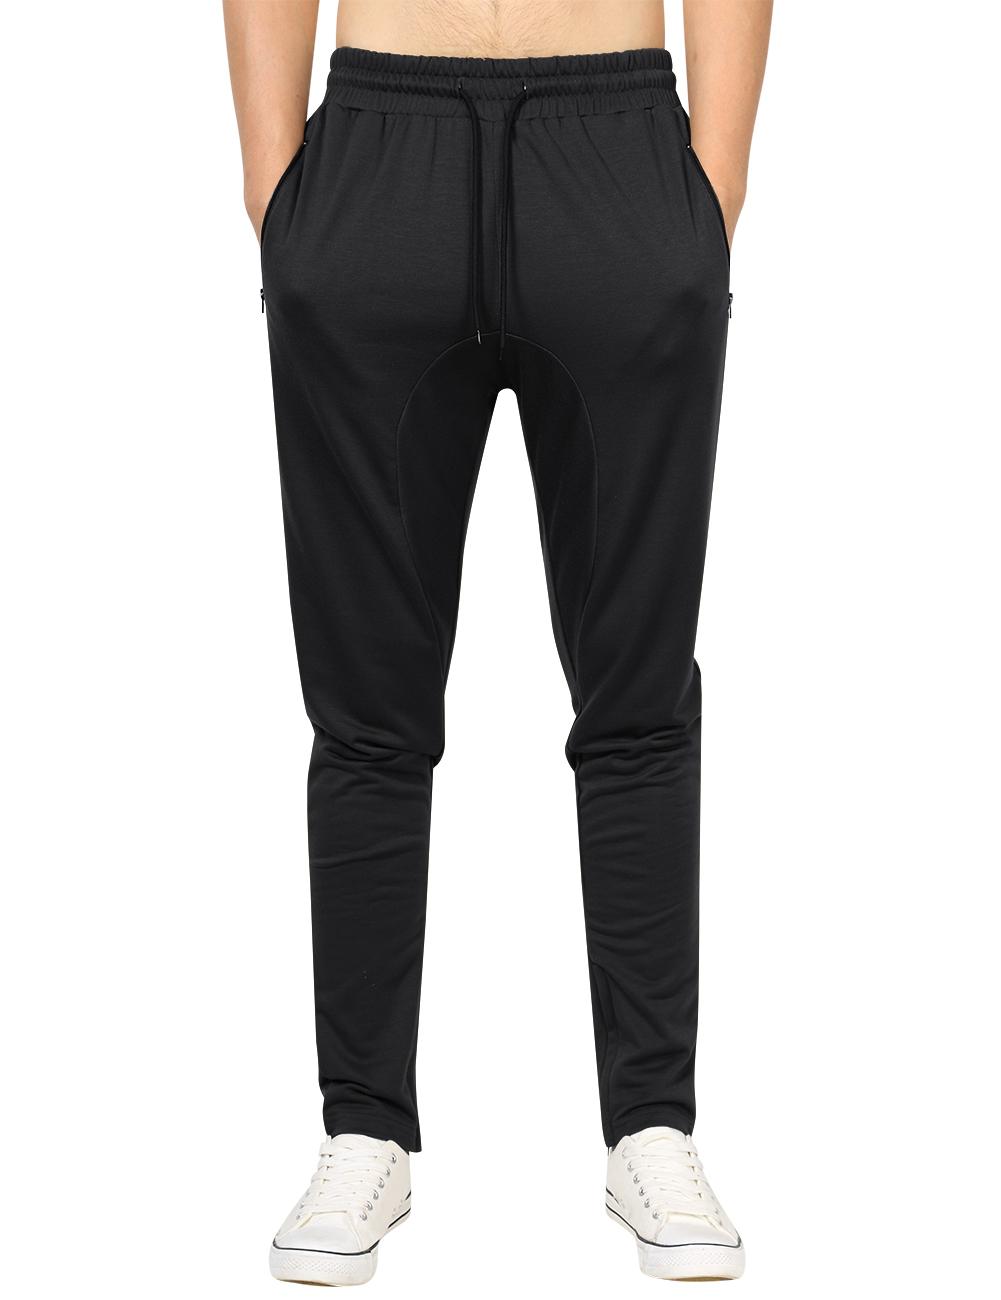 Yong Horse Men's Casual Joggers Slim Fit Ankle Zipper Pocket Drawstring Waist Open Bottoms Sweatpants Black_S